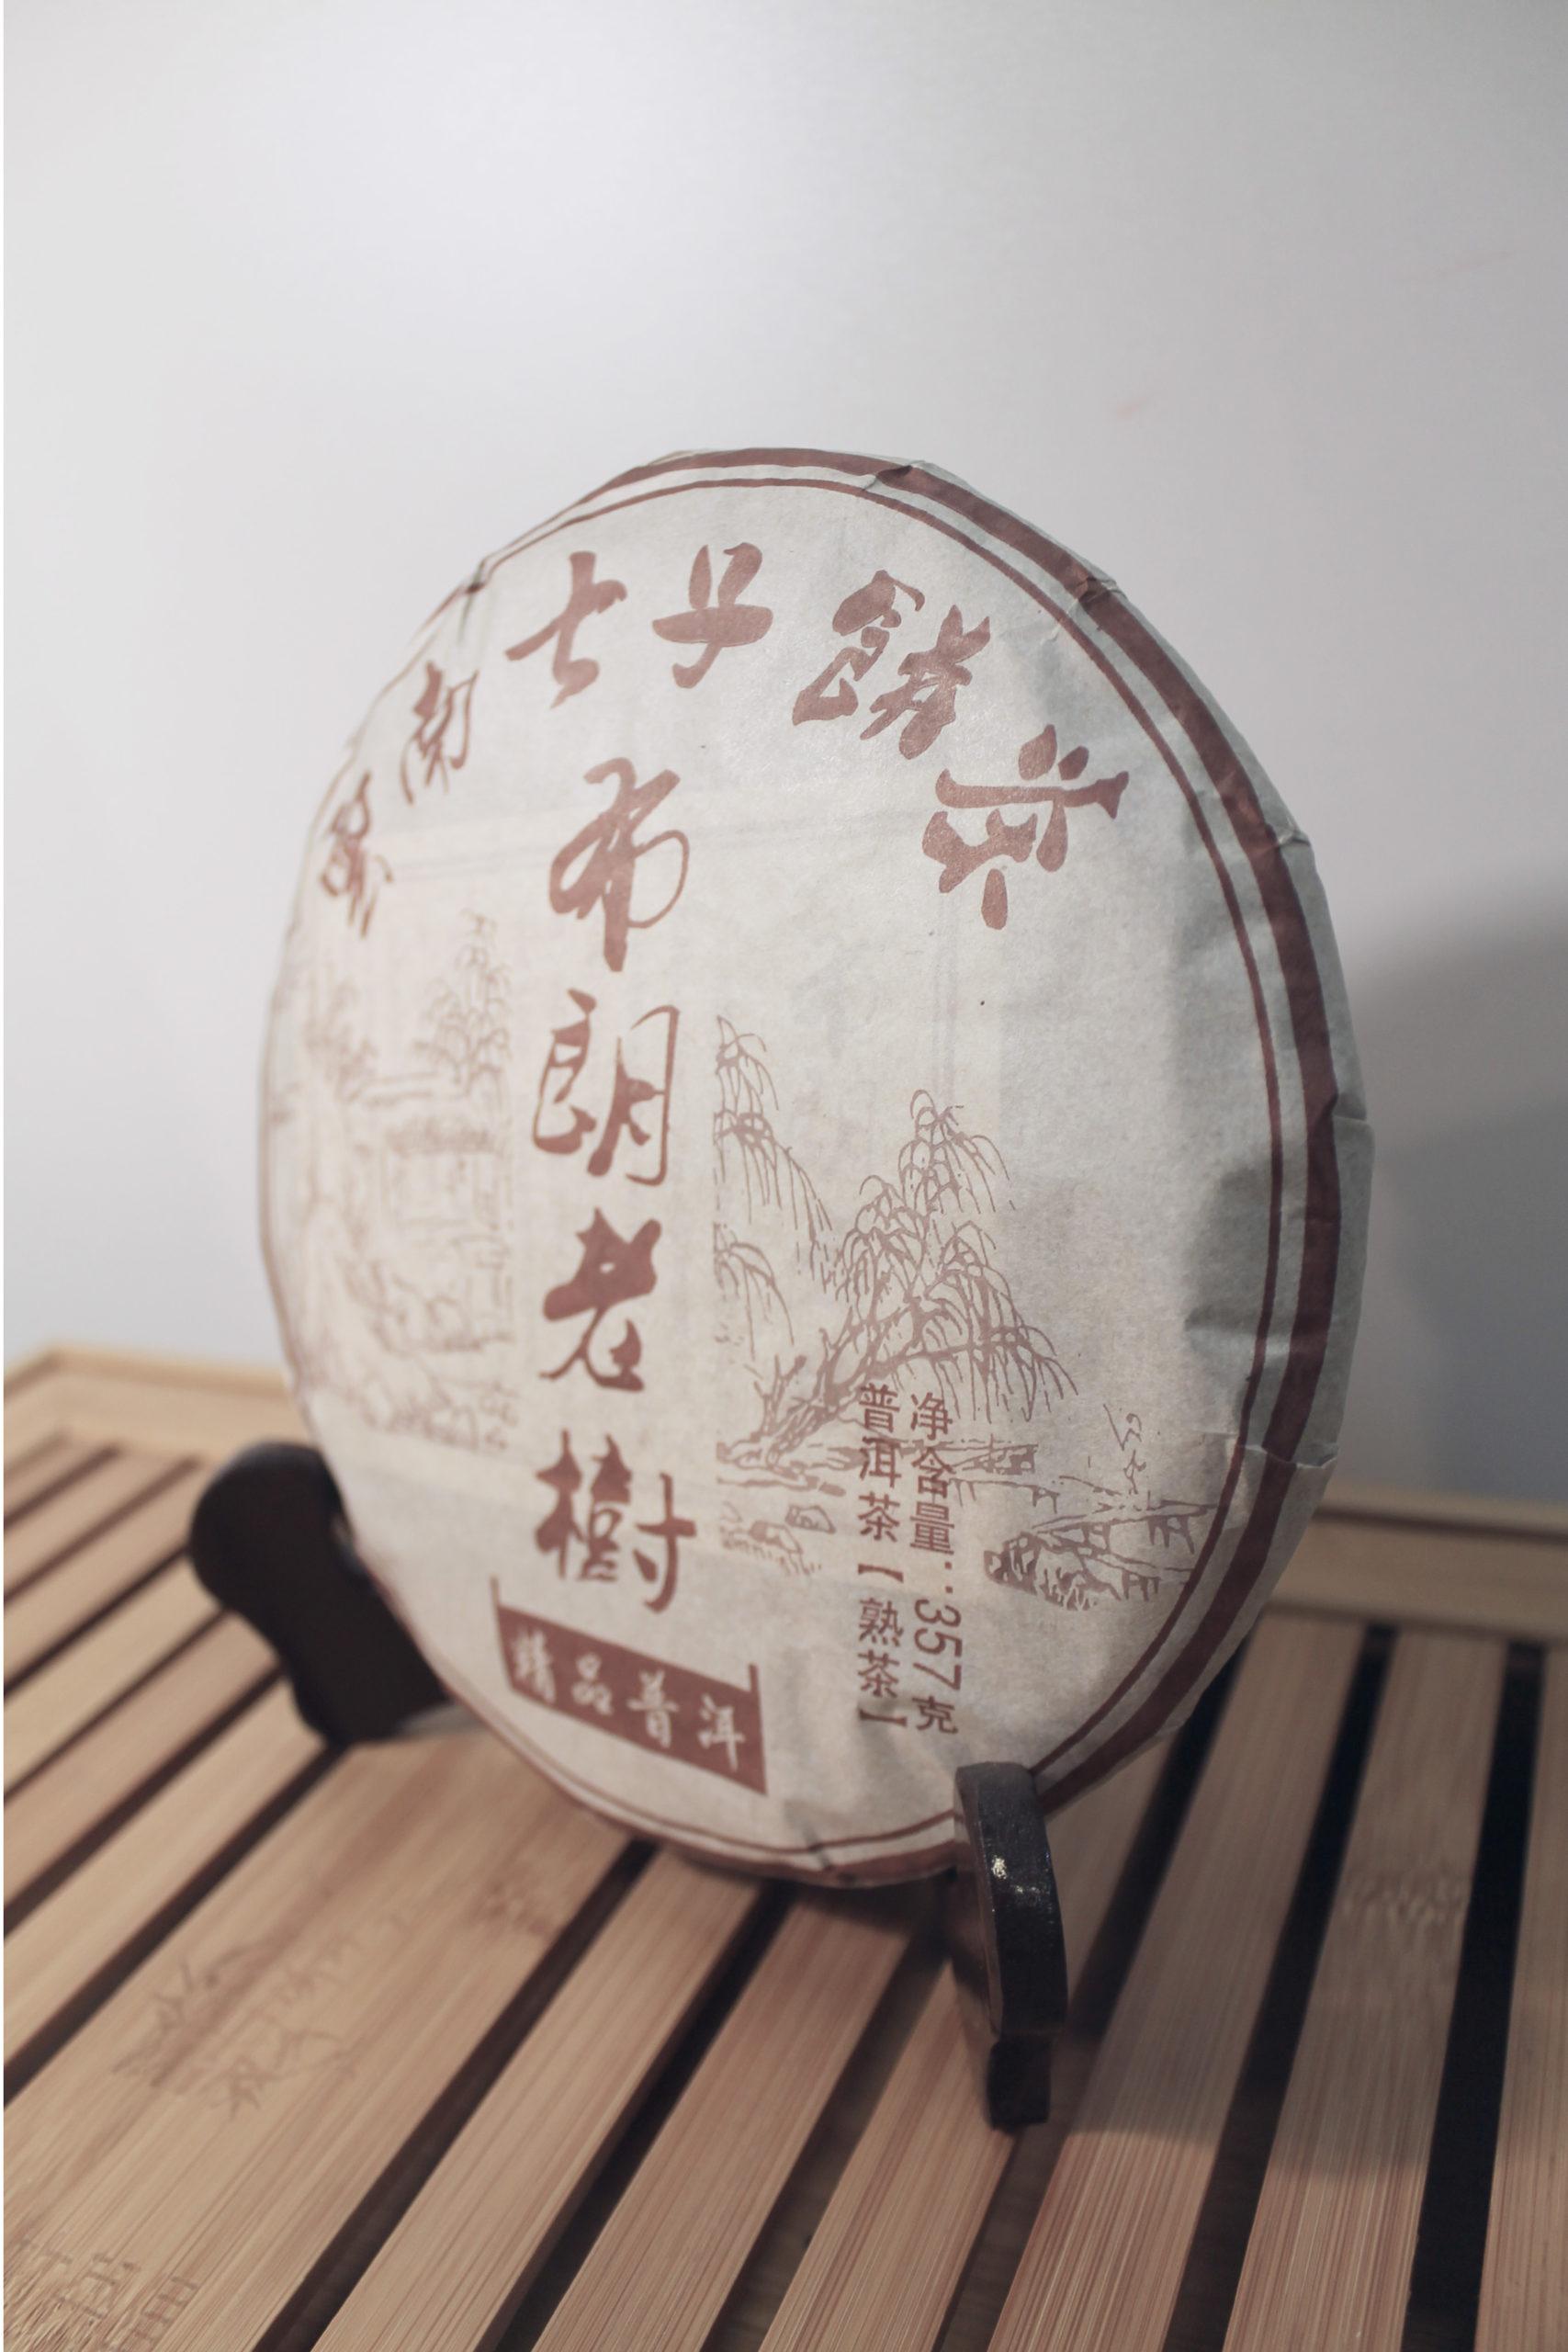 Шу Пуэр Булань Лао Шу